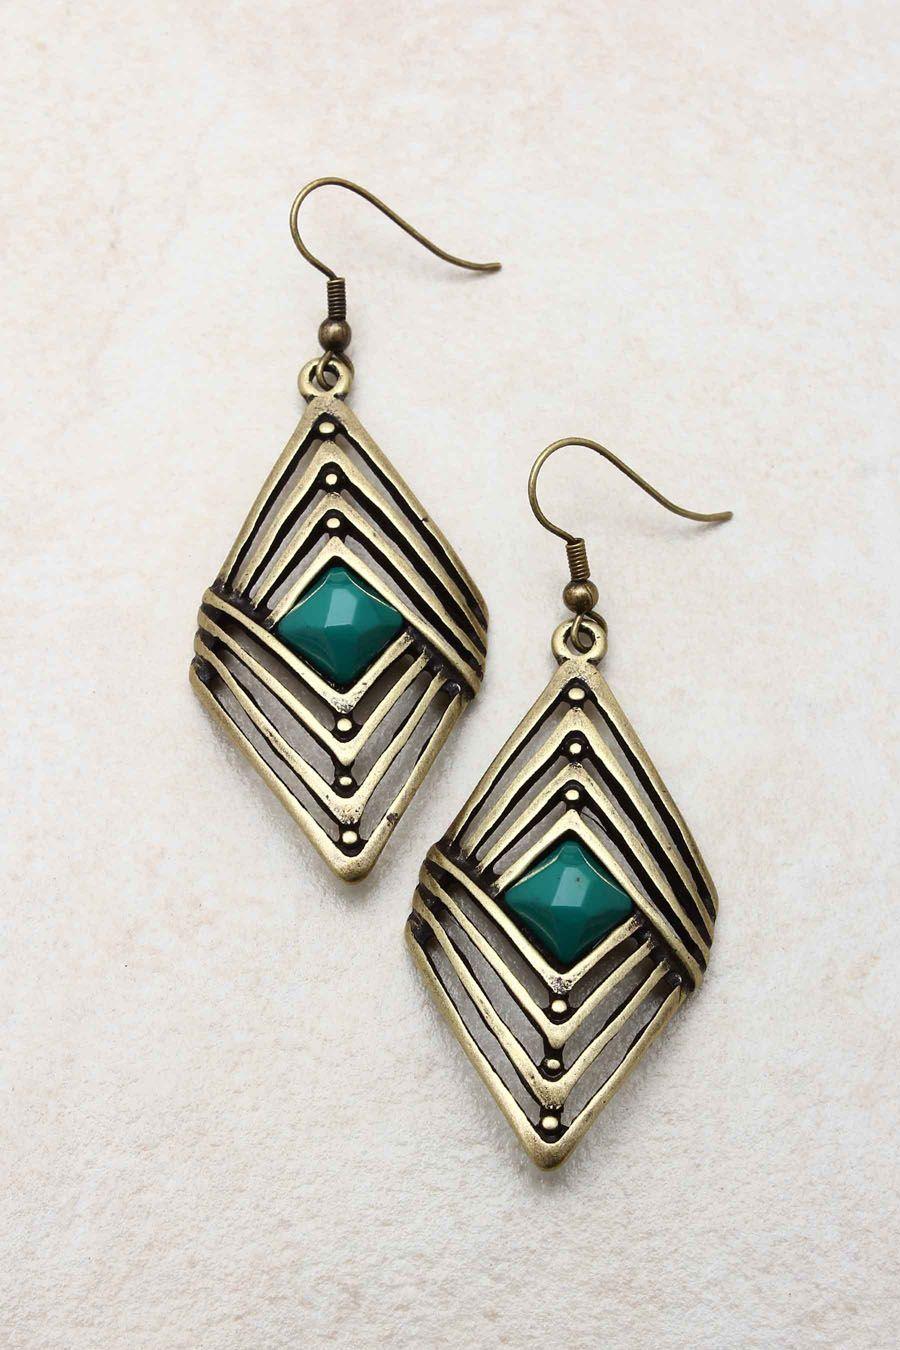 Paris Green Rella Earrings on Emma Stine Limited